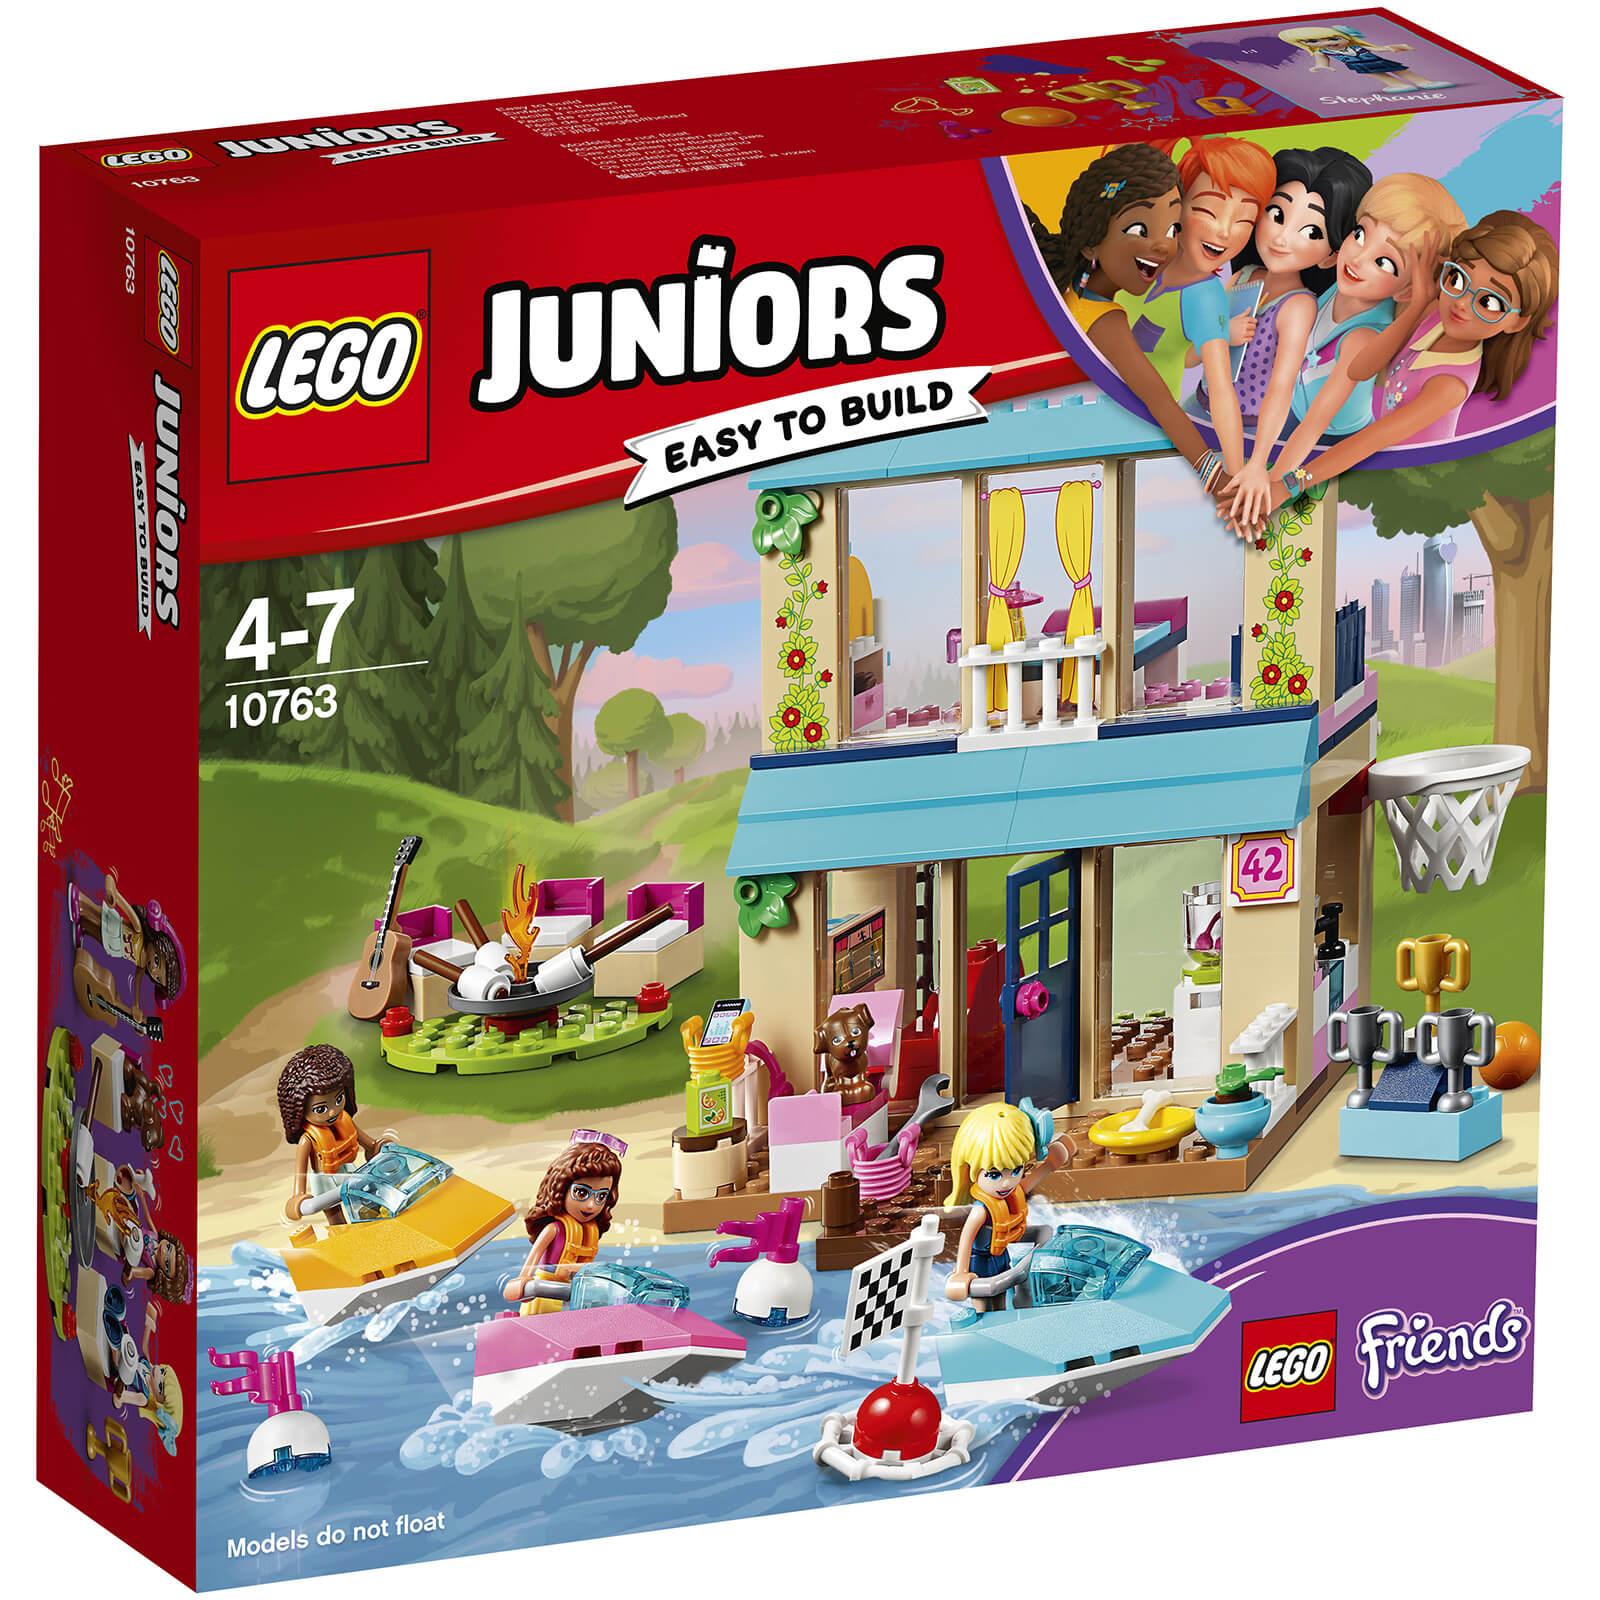 Lego Juniors Friends: Stephanie's Lakeside House (10763)